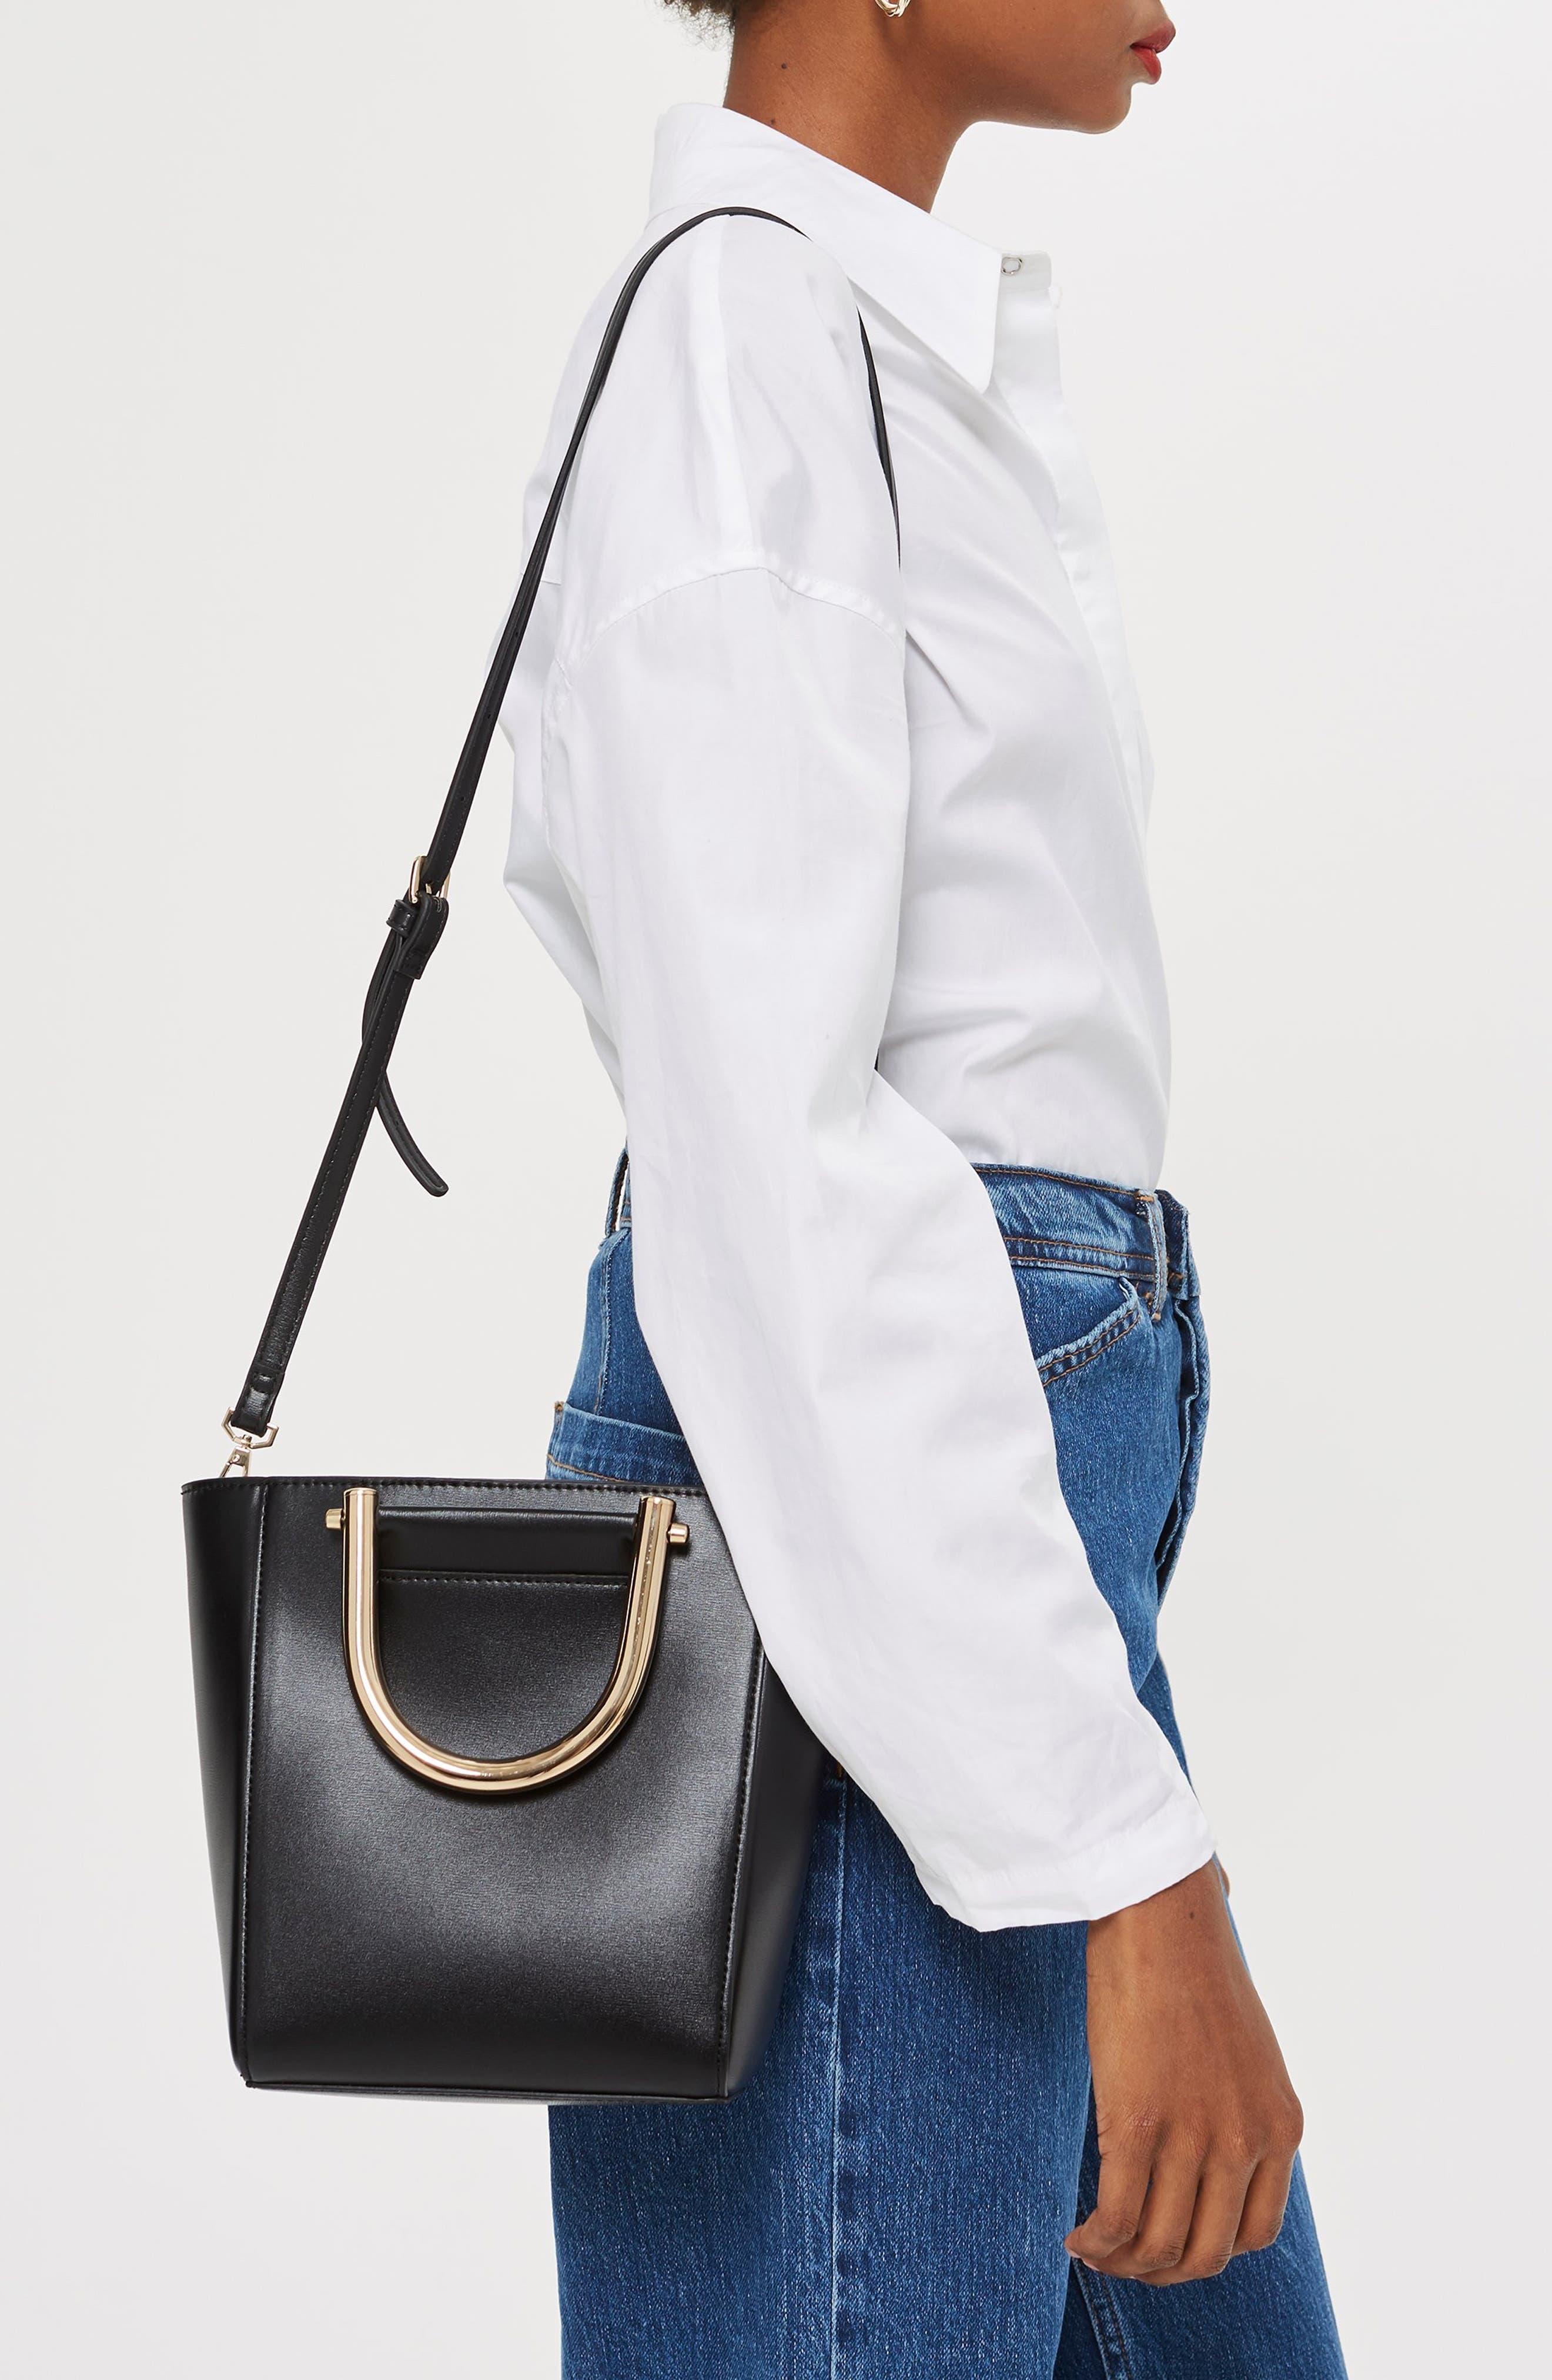 TOPSHOP,                             Lacey Metal Top Handle Shoulder Bag,                             Alternate thumbnail 2, color,                             001